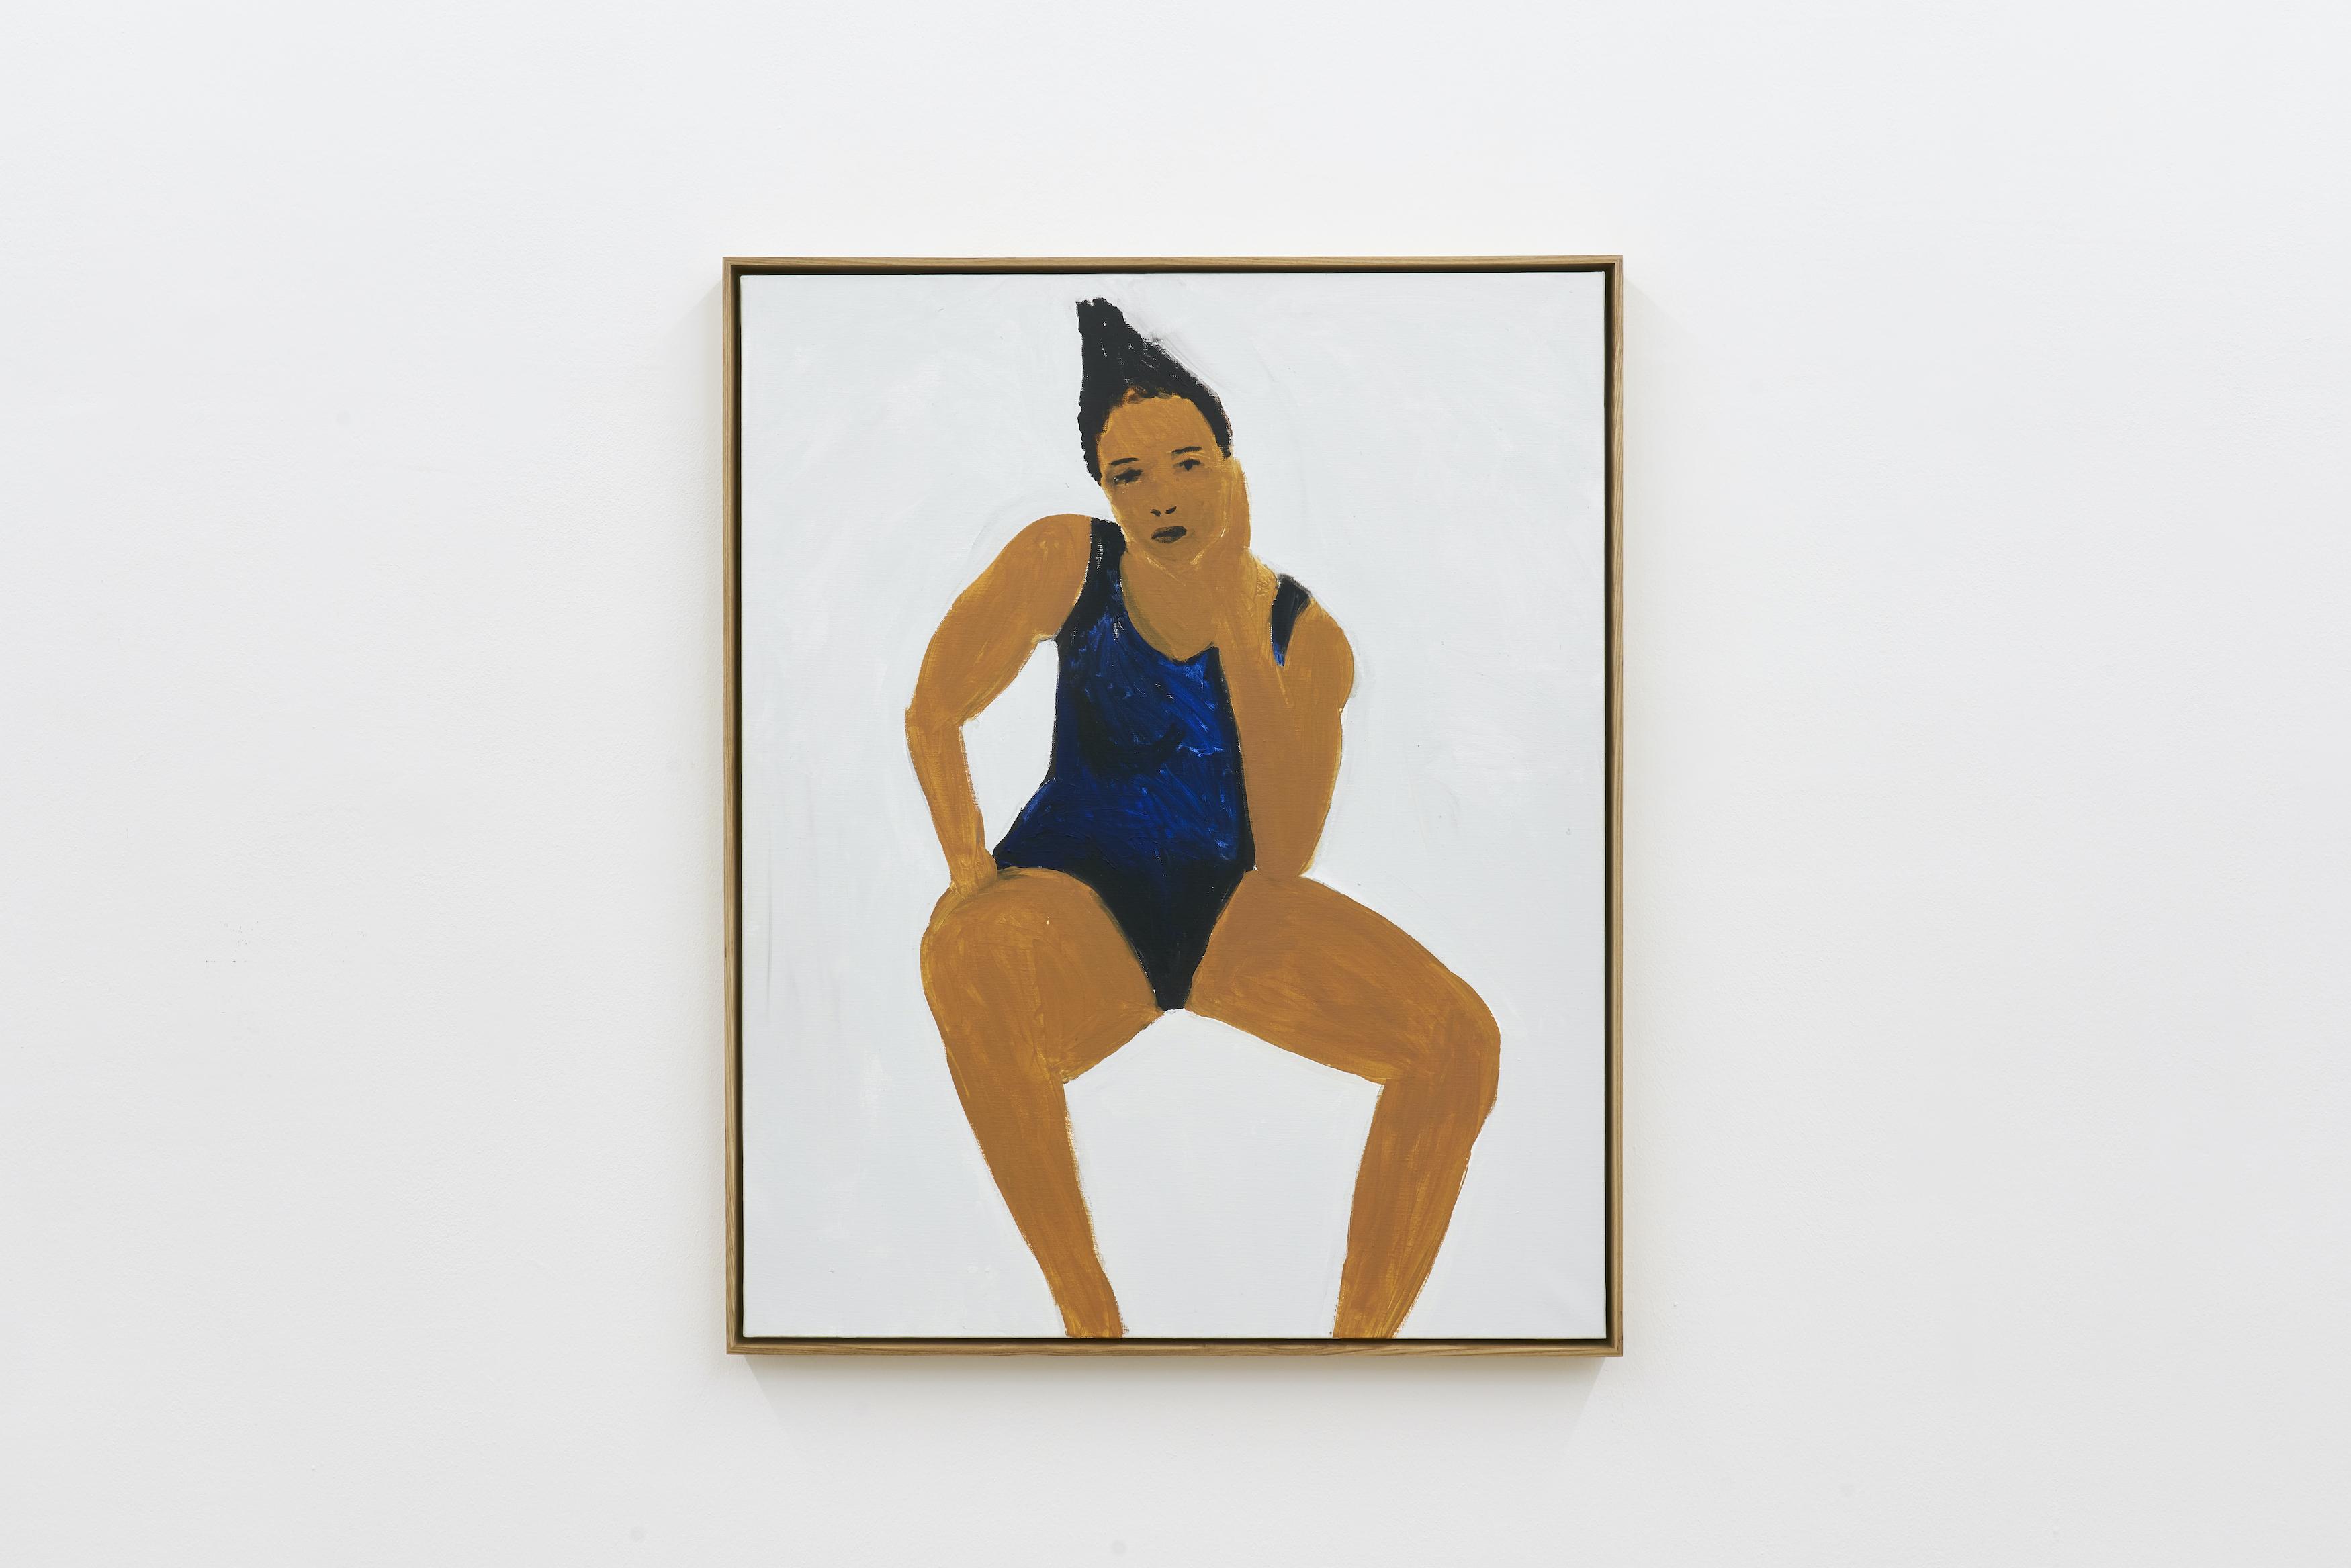 Gregory Olympio, Victory, 2021, Acrylic on canvas, 100 x 81 cm.